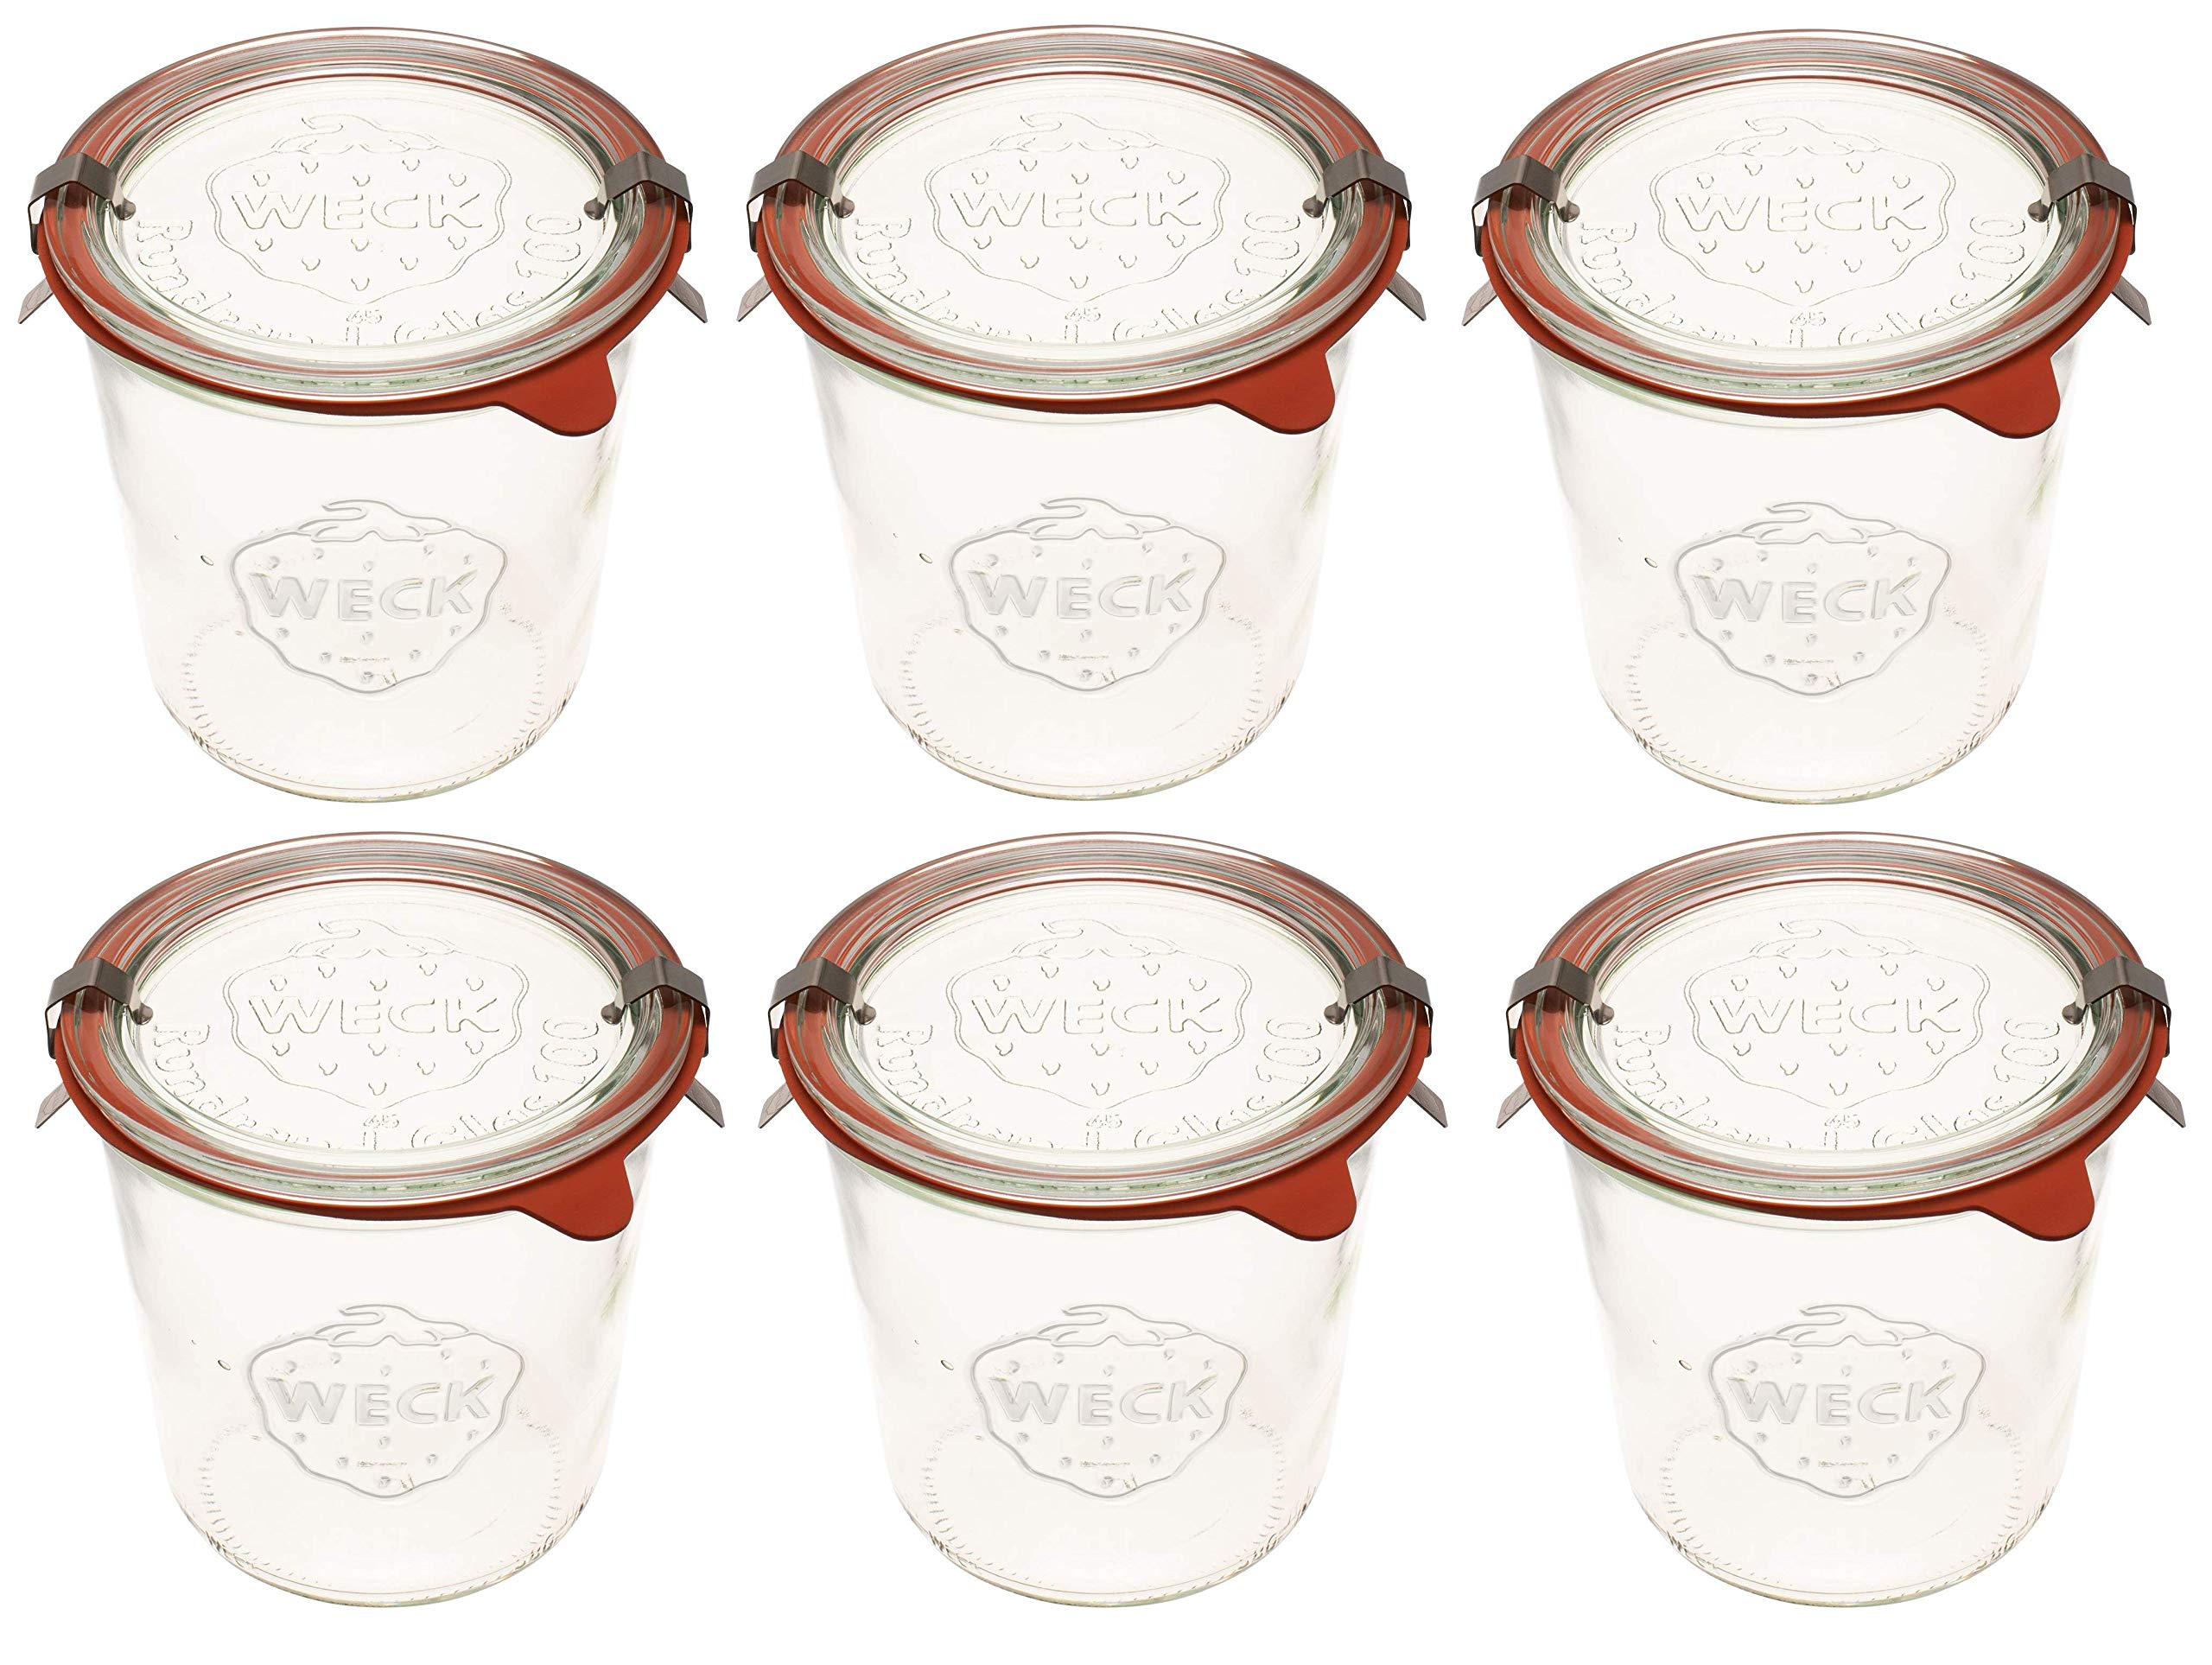 Weck 742 Mold Jar - .5 Liter, Set of 6